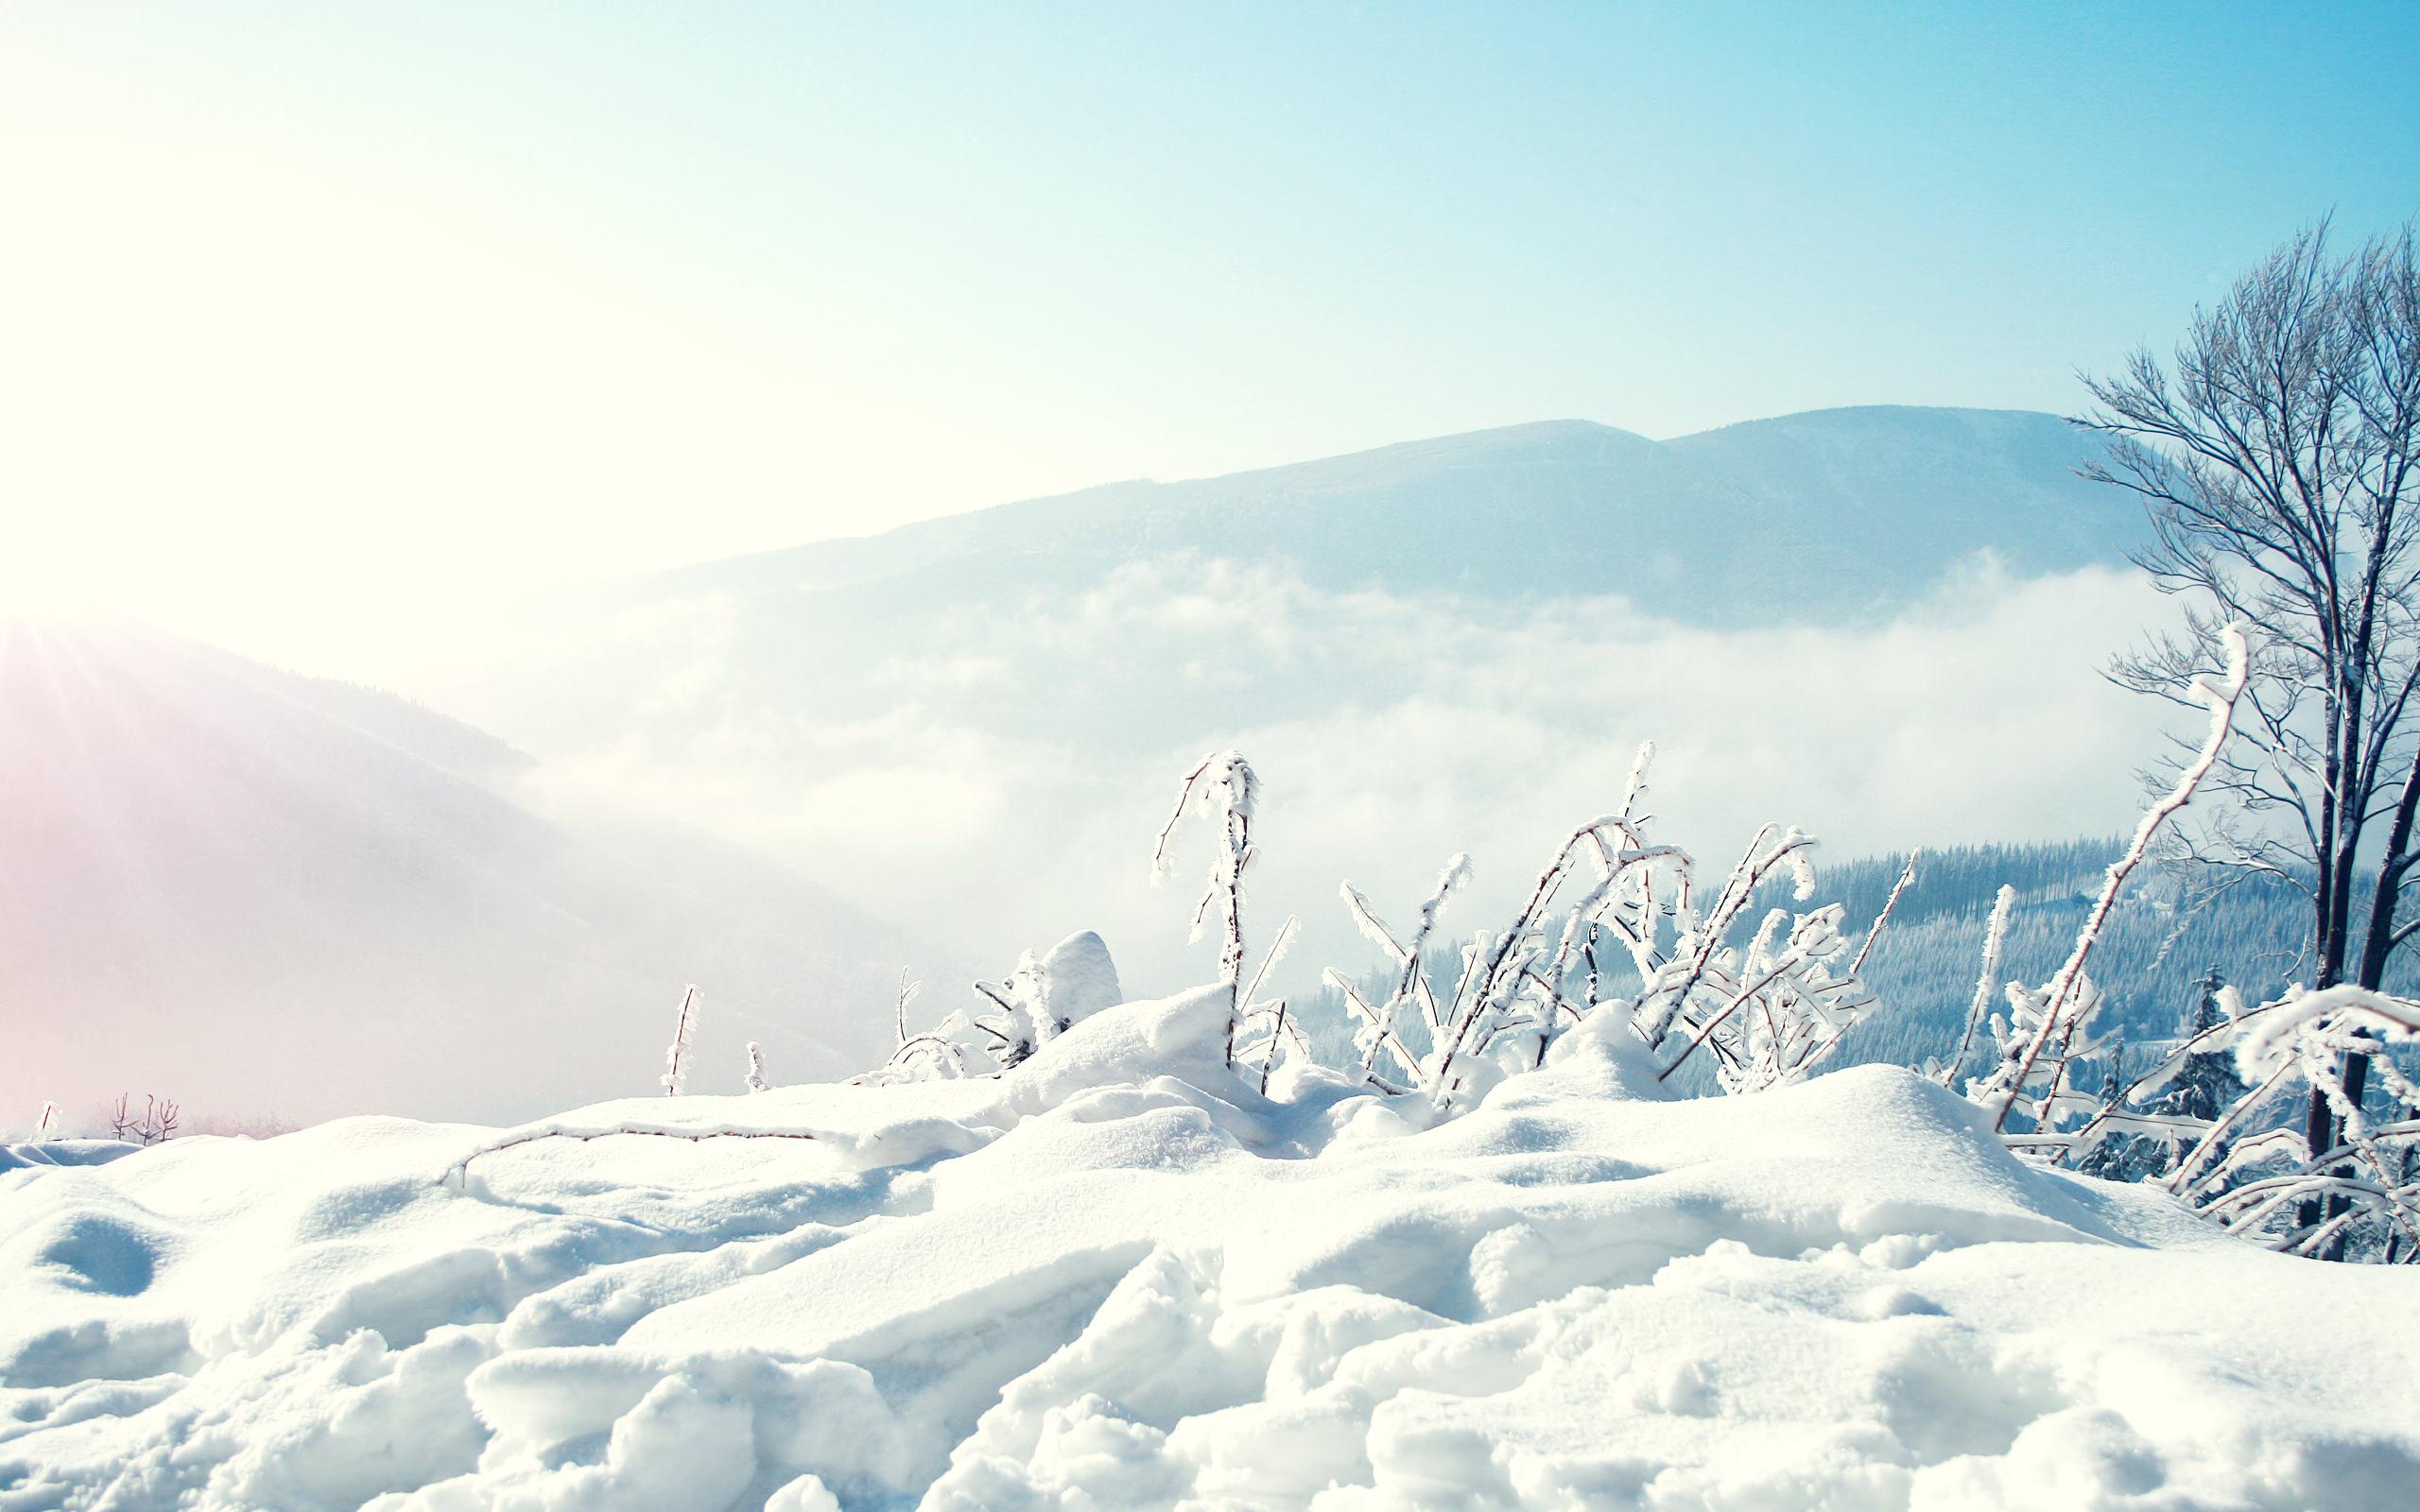 snow winter mountains wallpaper